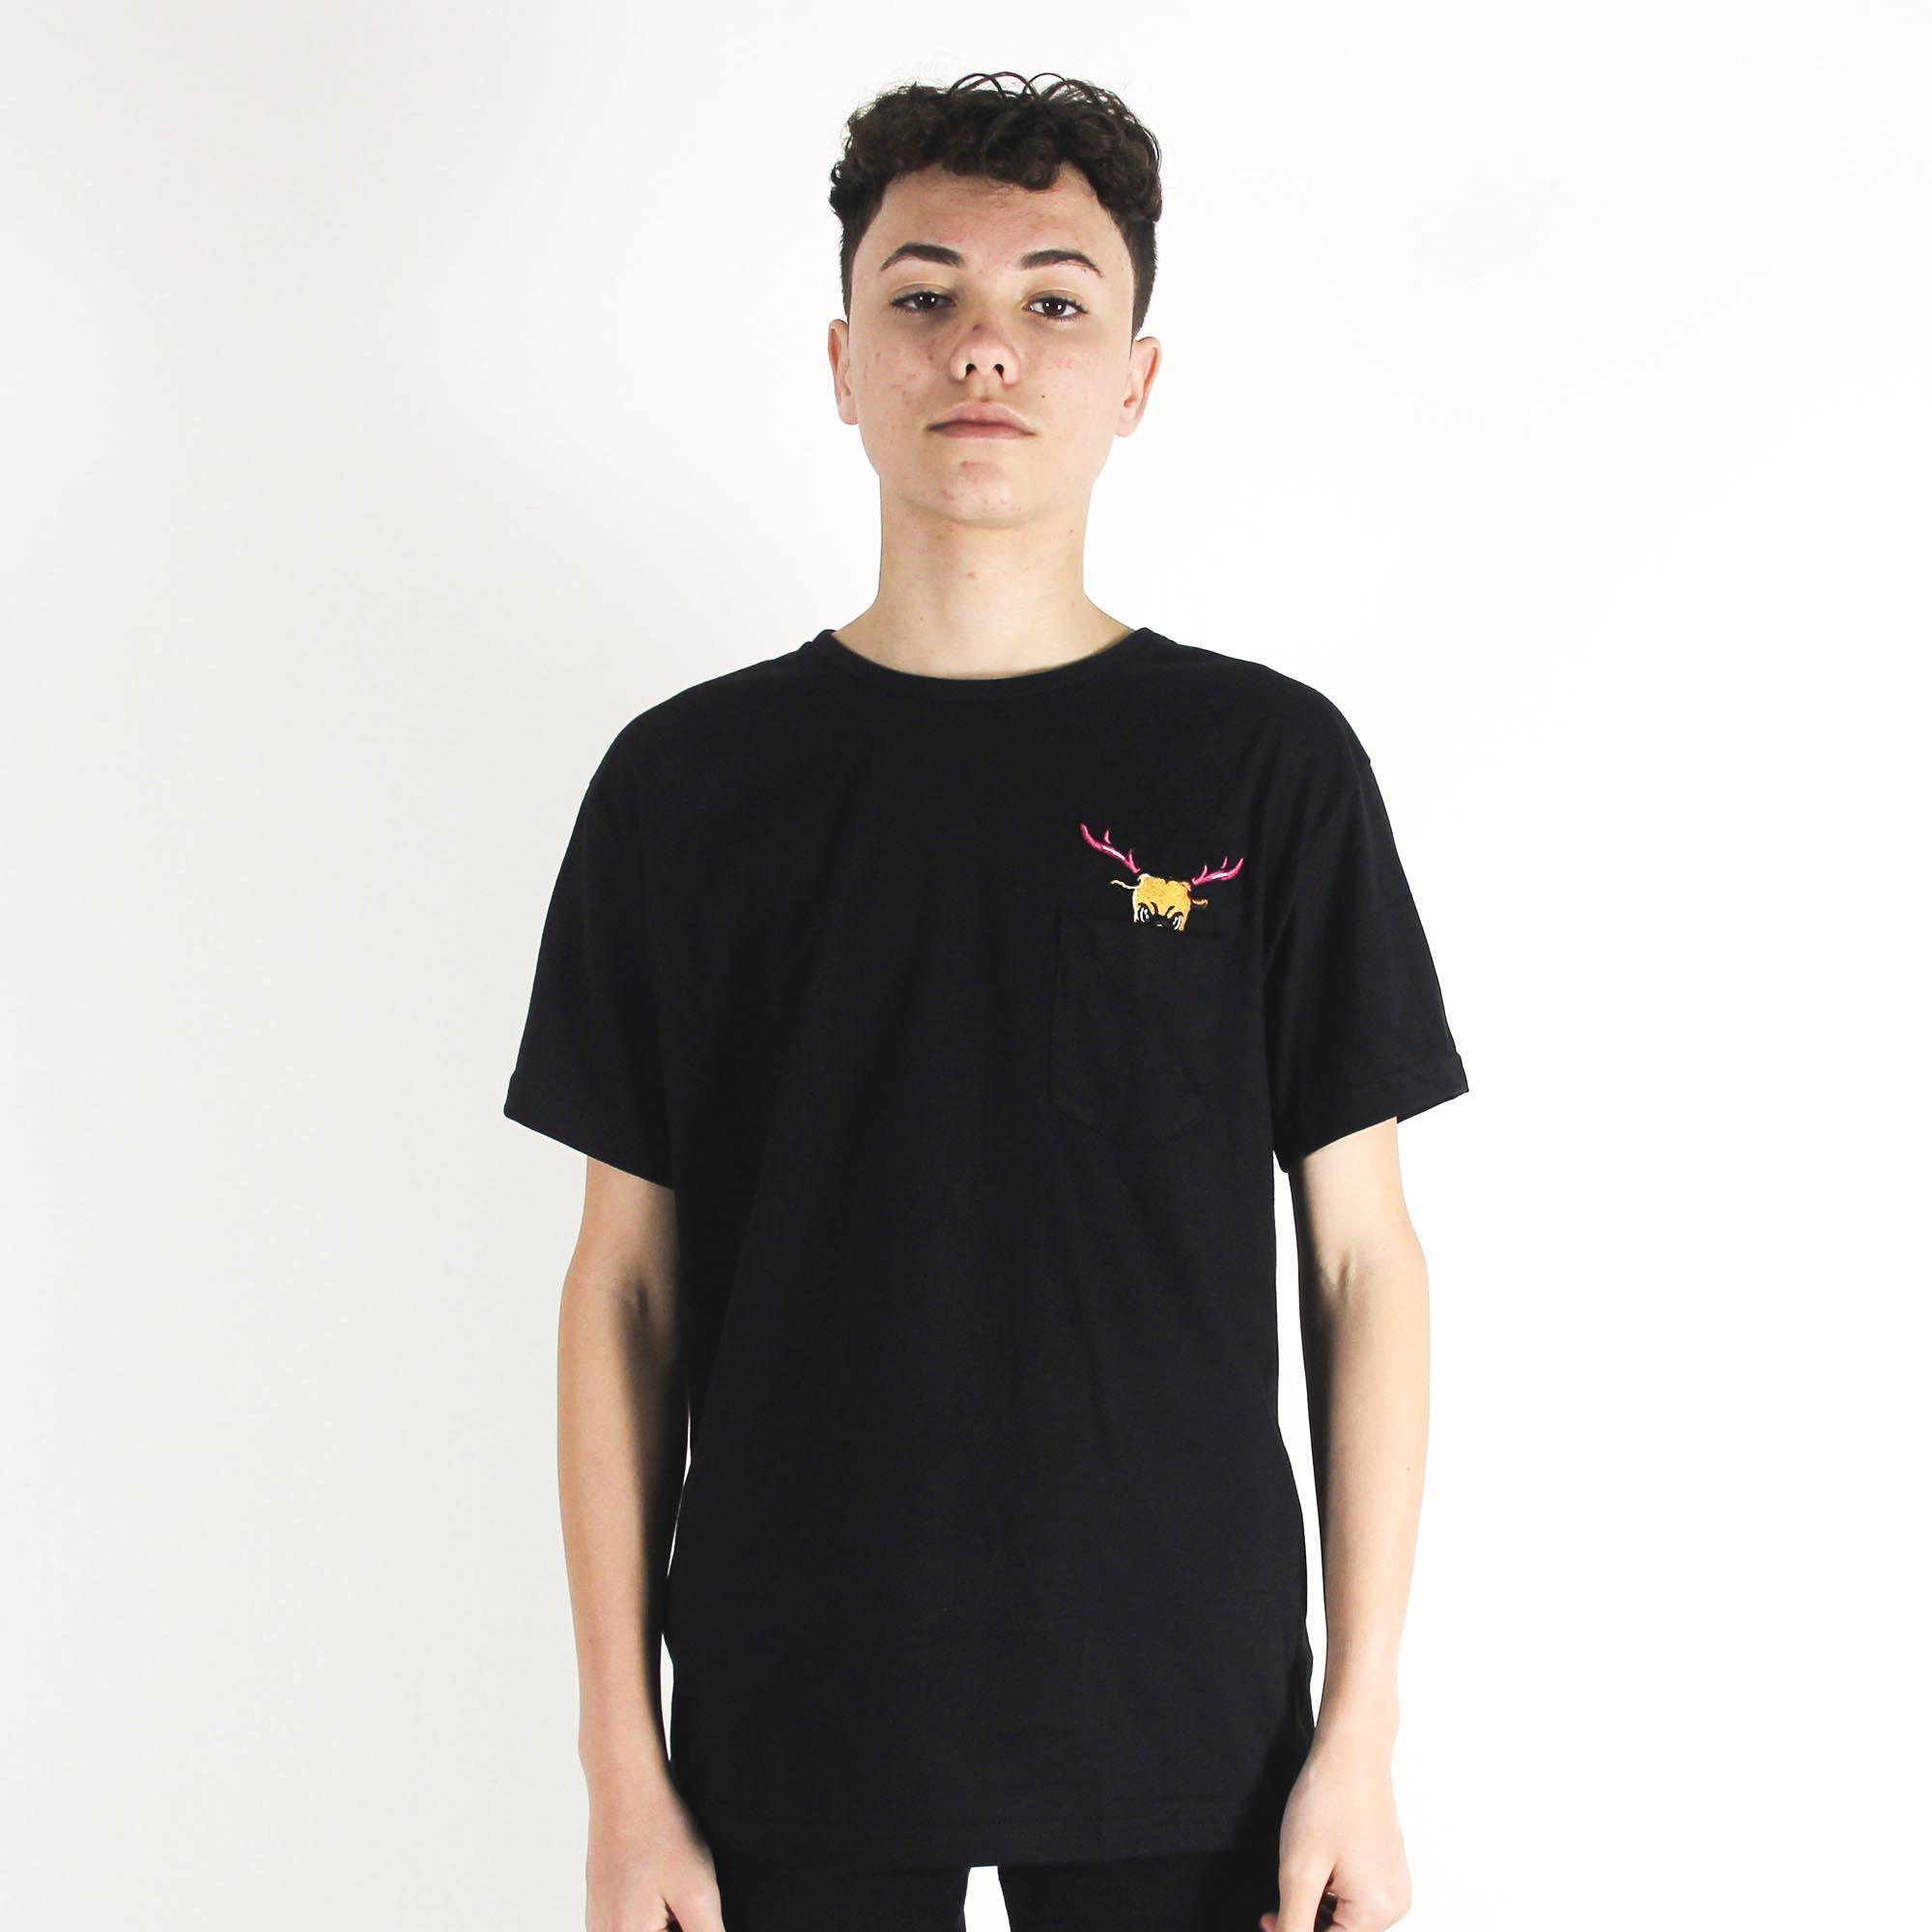 Camiseta Deercheerup Oficial Preta #1